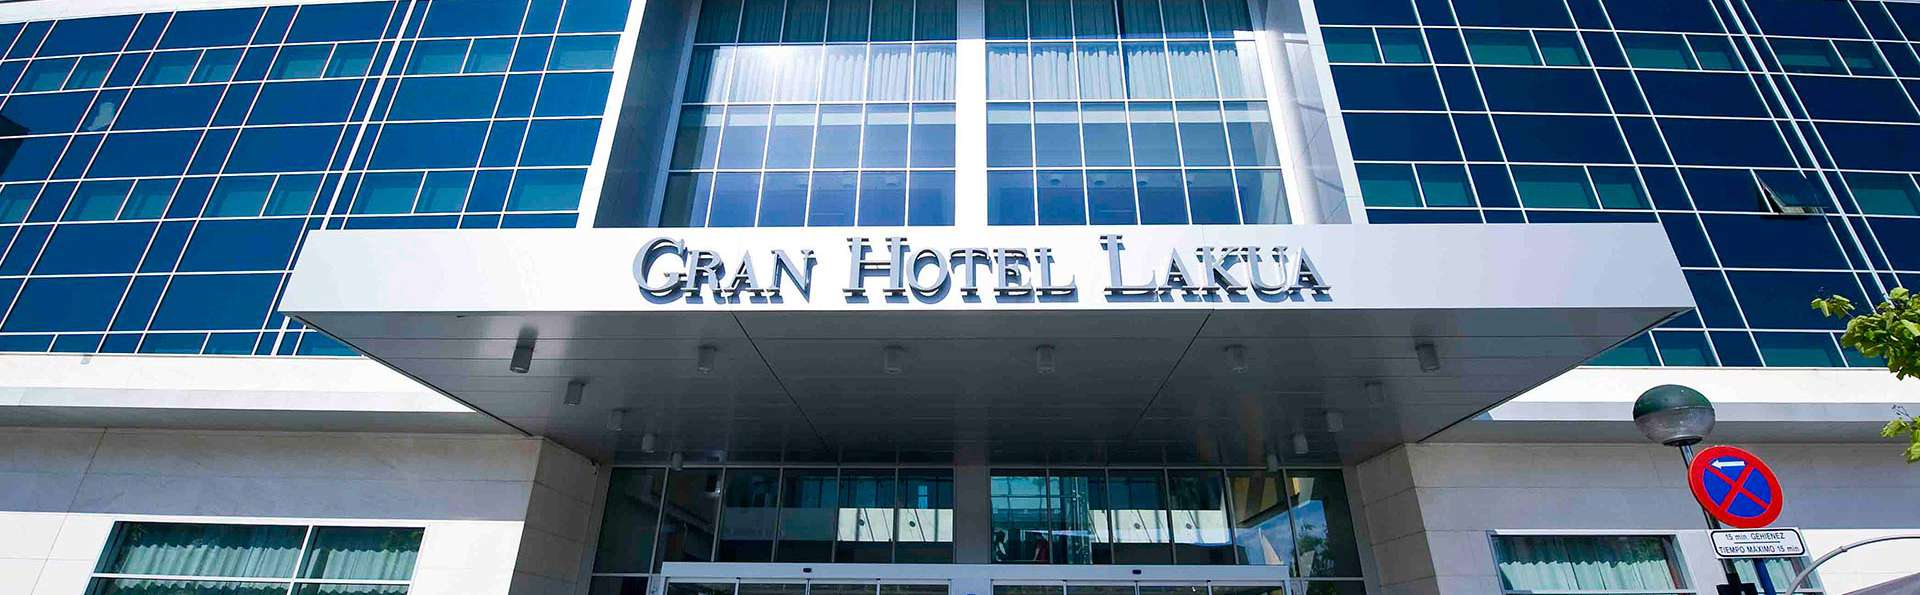 Gran Hotel Lakua - EDIT_front3.jpg